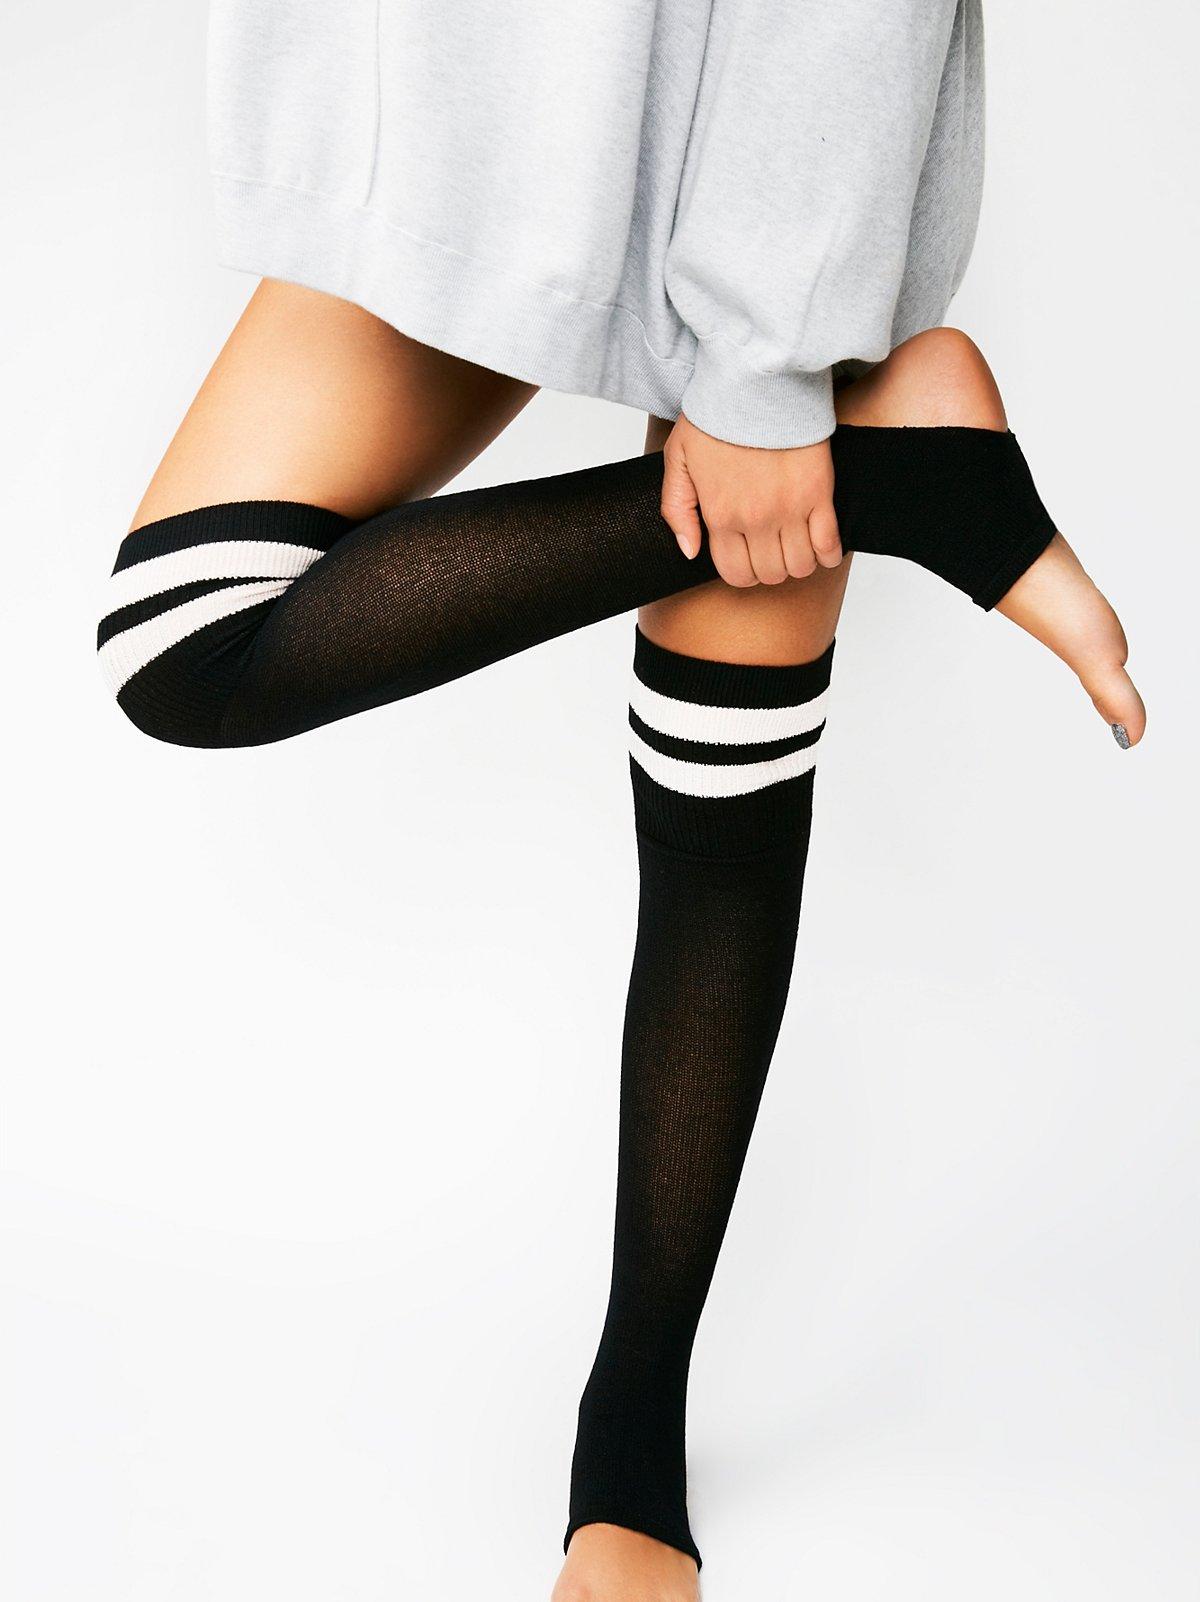 Goals Dance暖腿袜